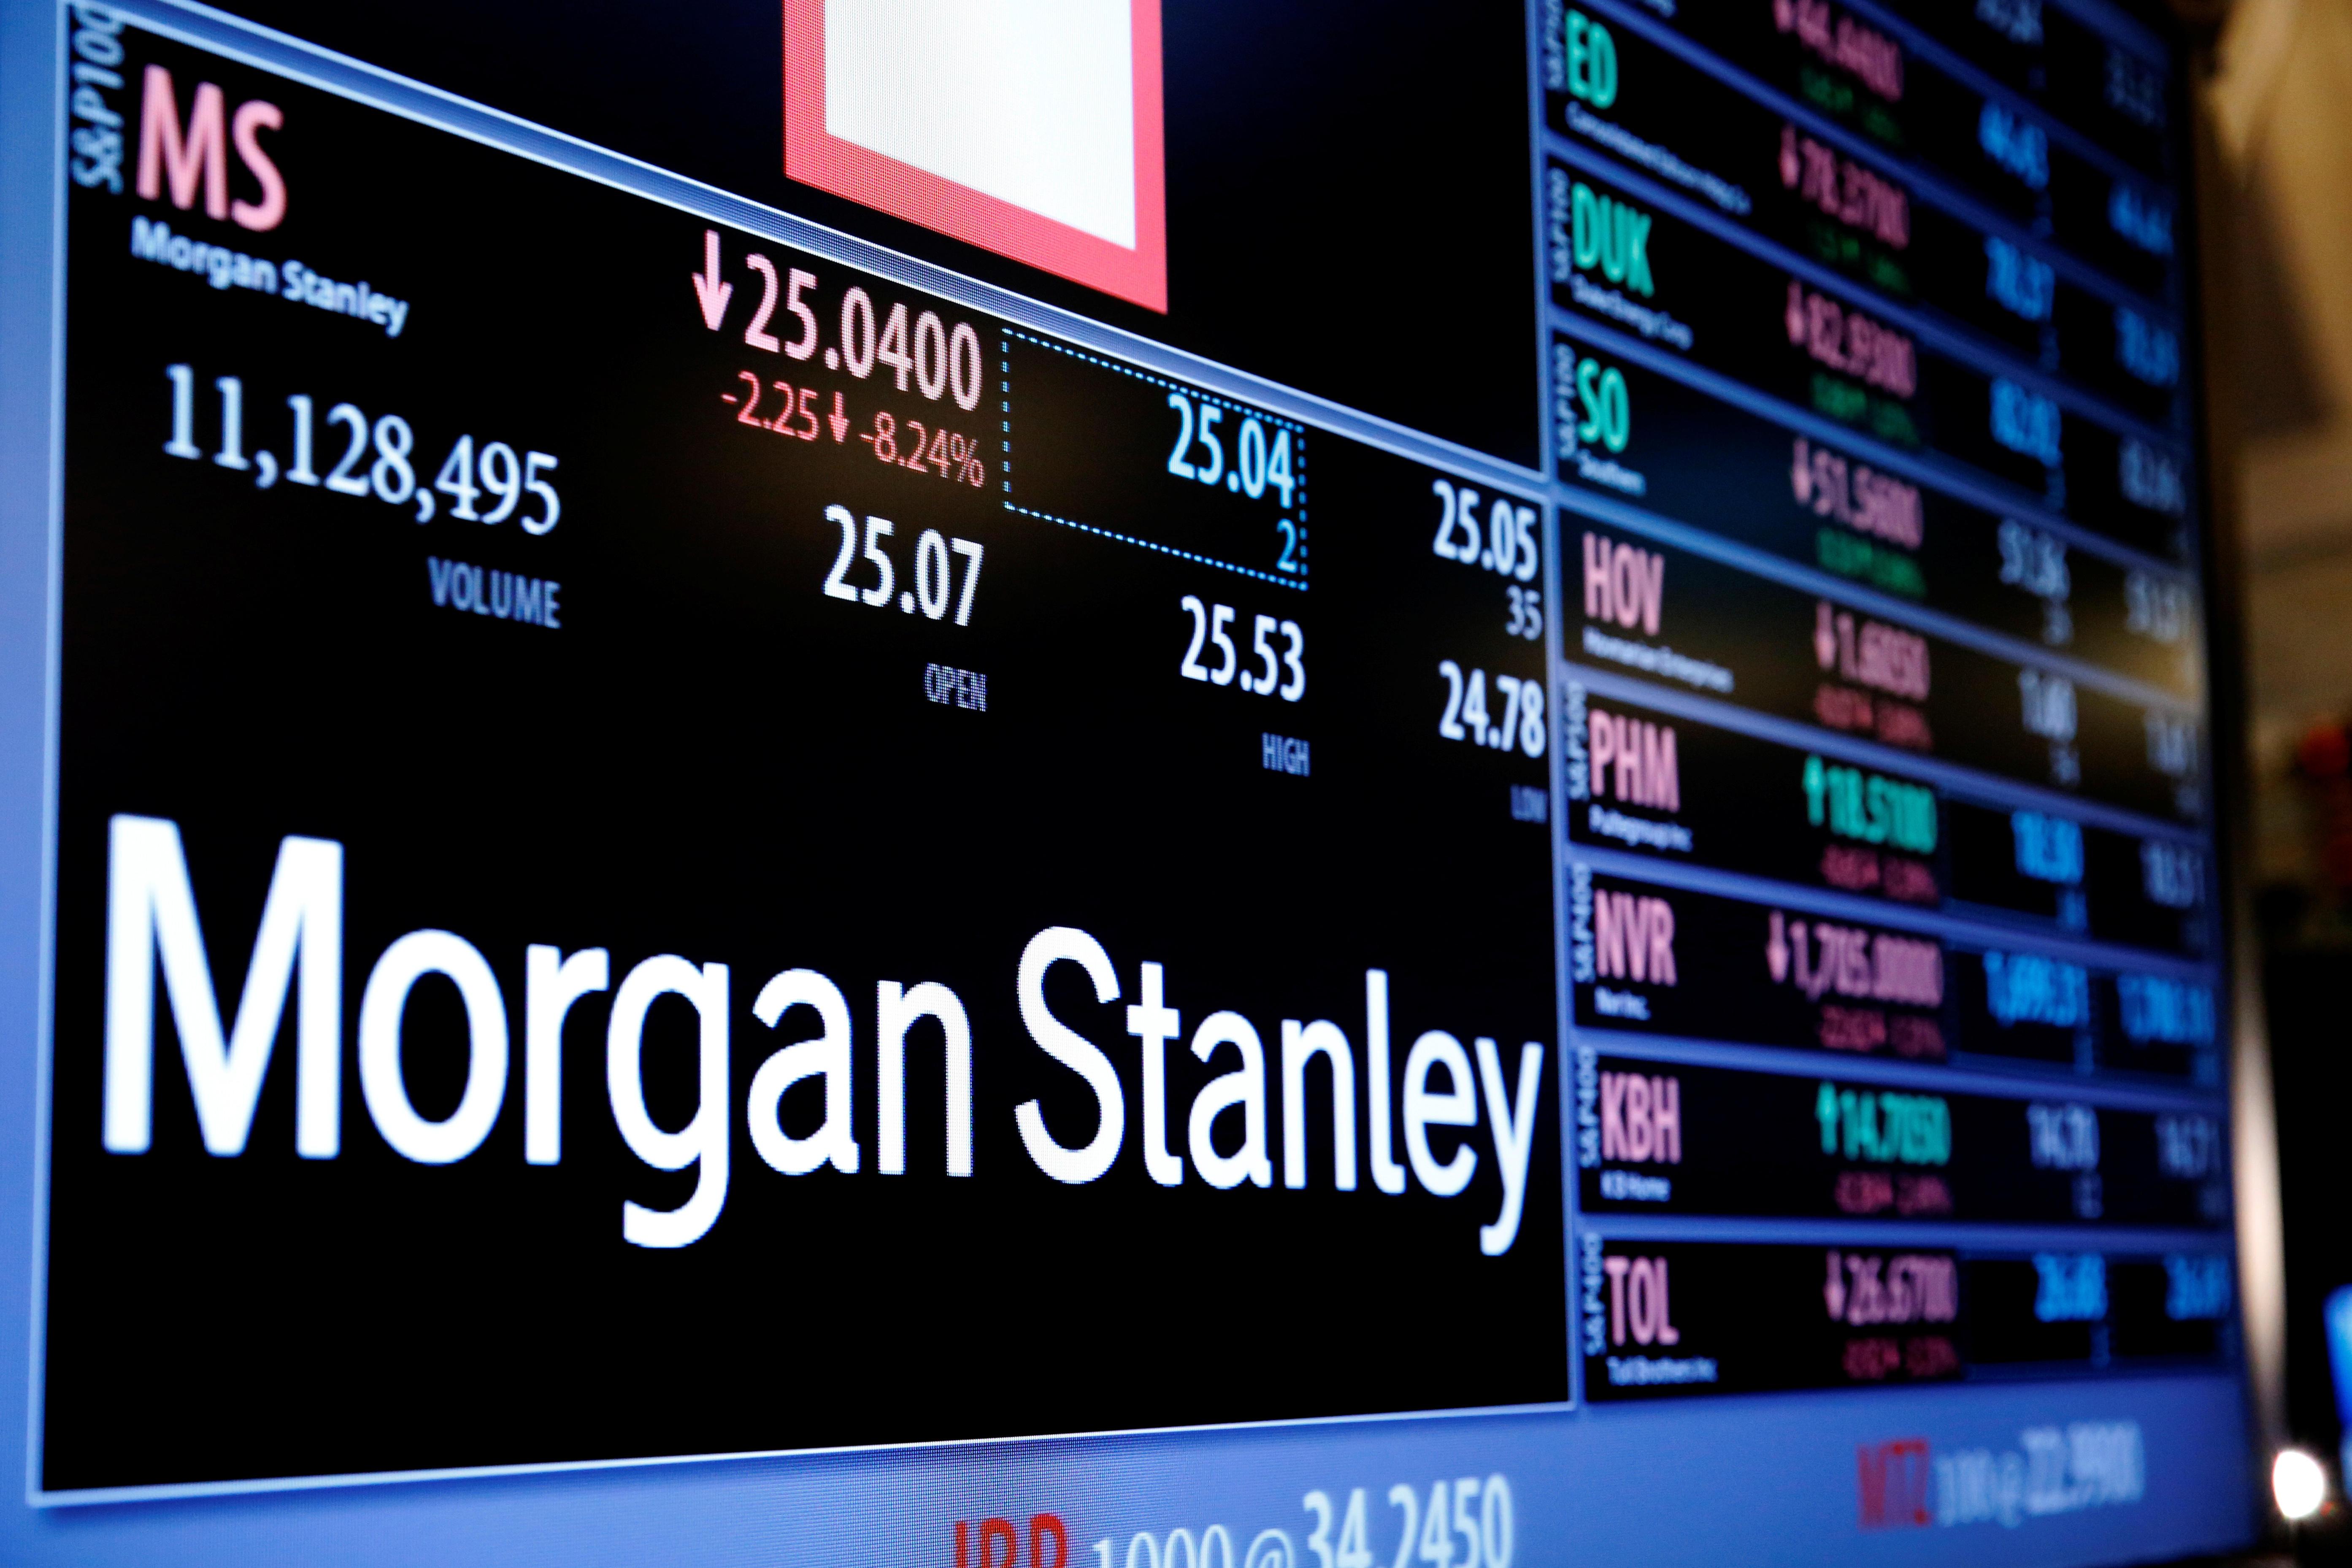 Created At 2017 10 17 1830 Amazoncom Digital Voice Recorder 2060 Sec Circuit Board Kit Fa941 Valuewalkcom Wealth Management Pushes Morgan Stanleys Profit Higher